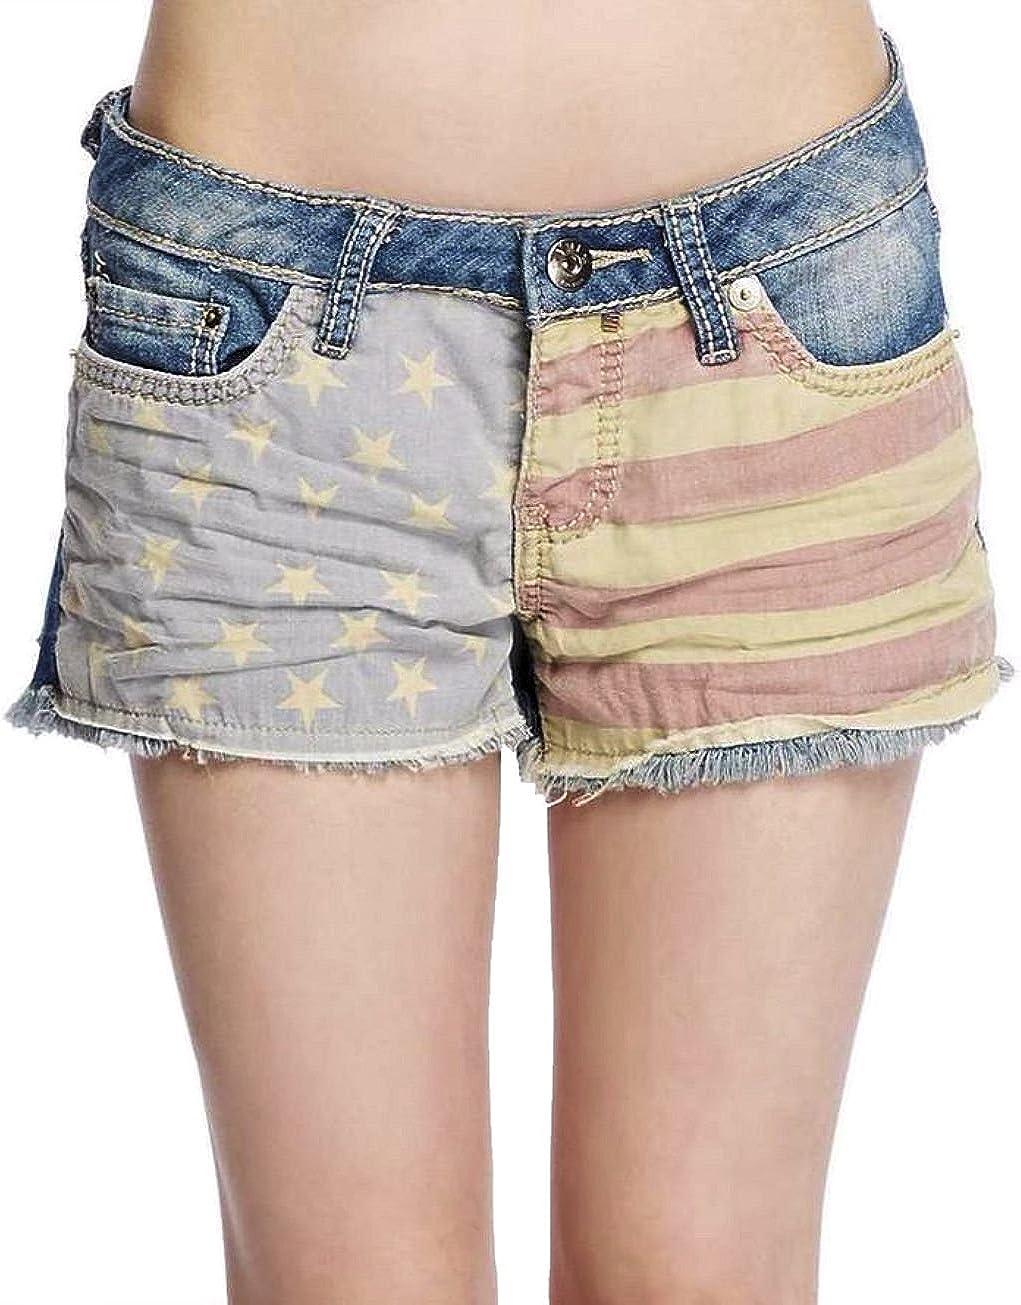 YMI Womens/Junior Patriotic Denim Shorts Frayed Hem